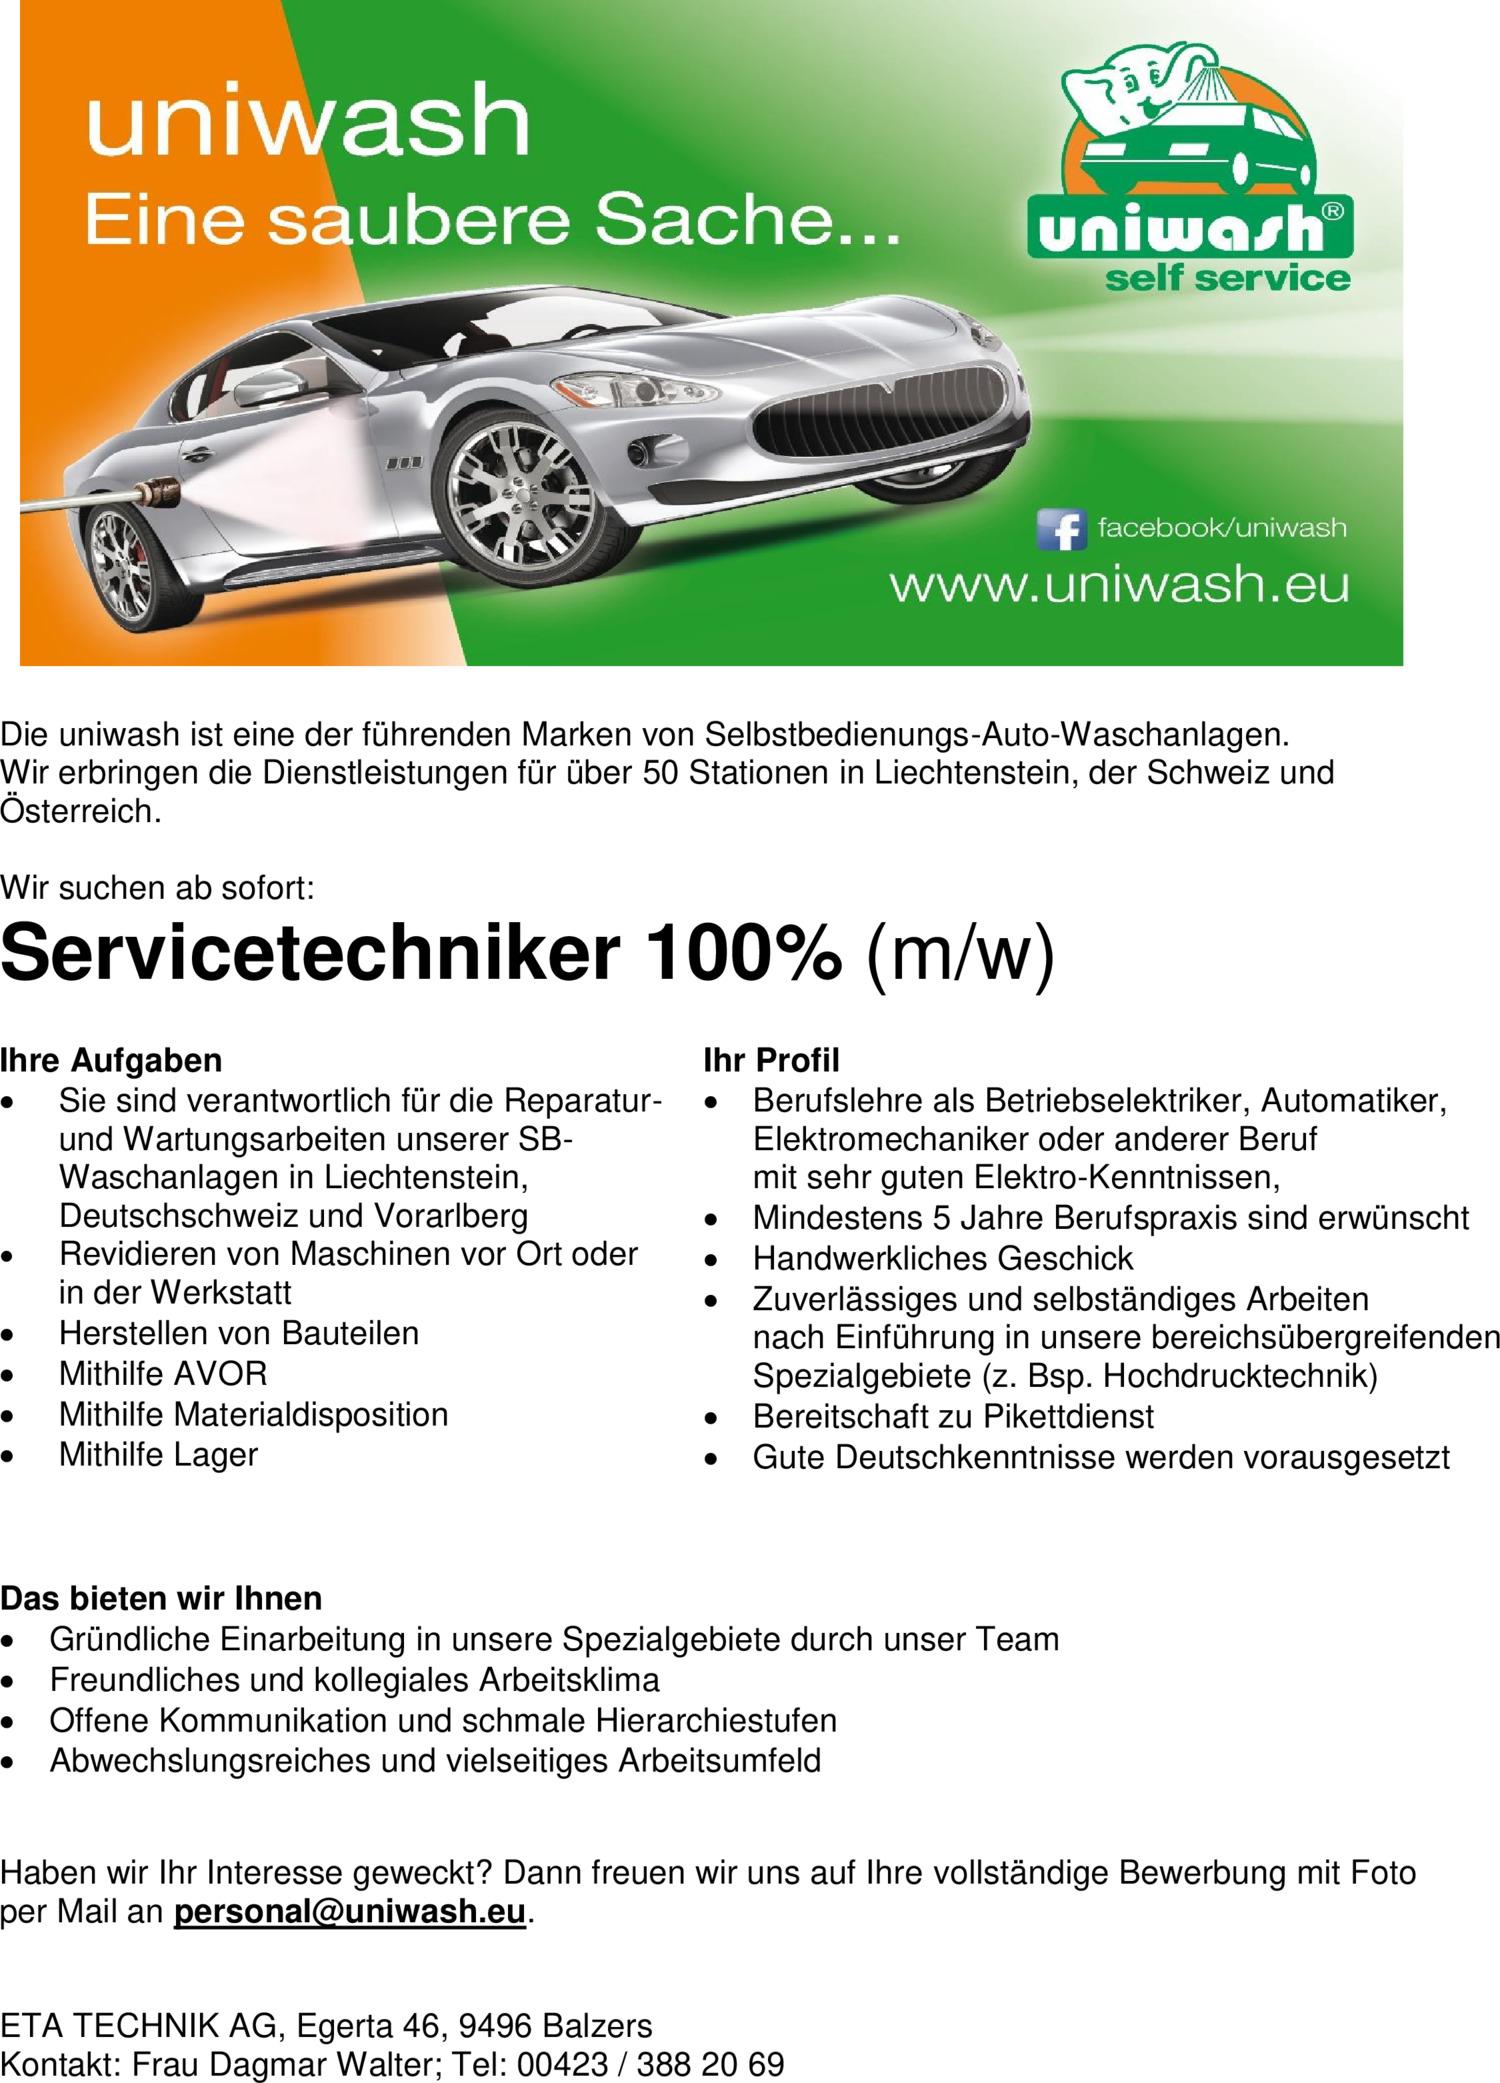 Inserat Servicetechniker 100% (m/w)